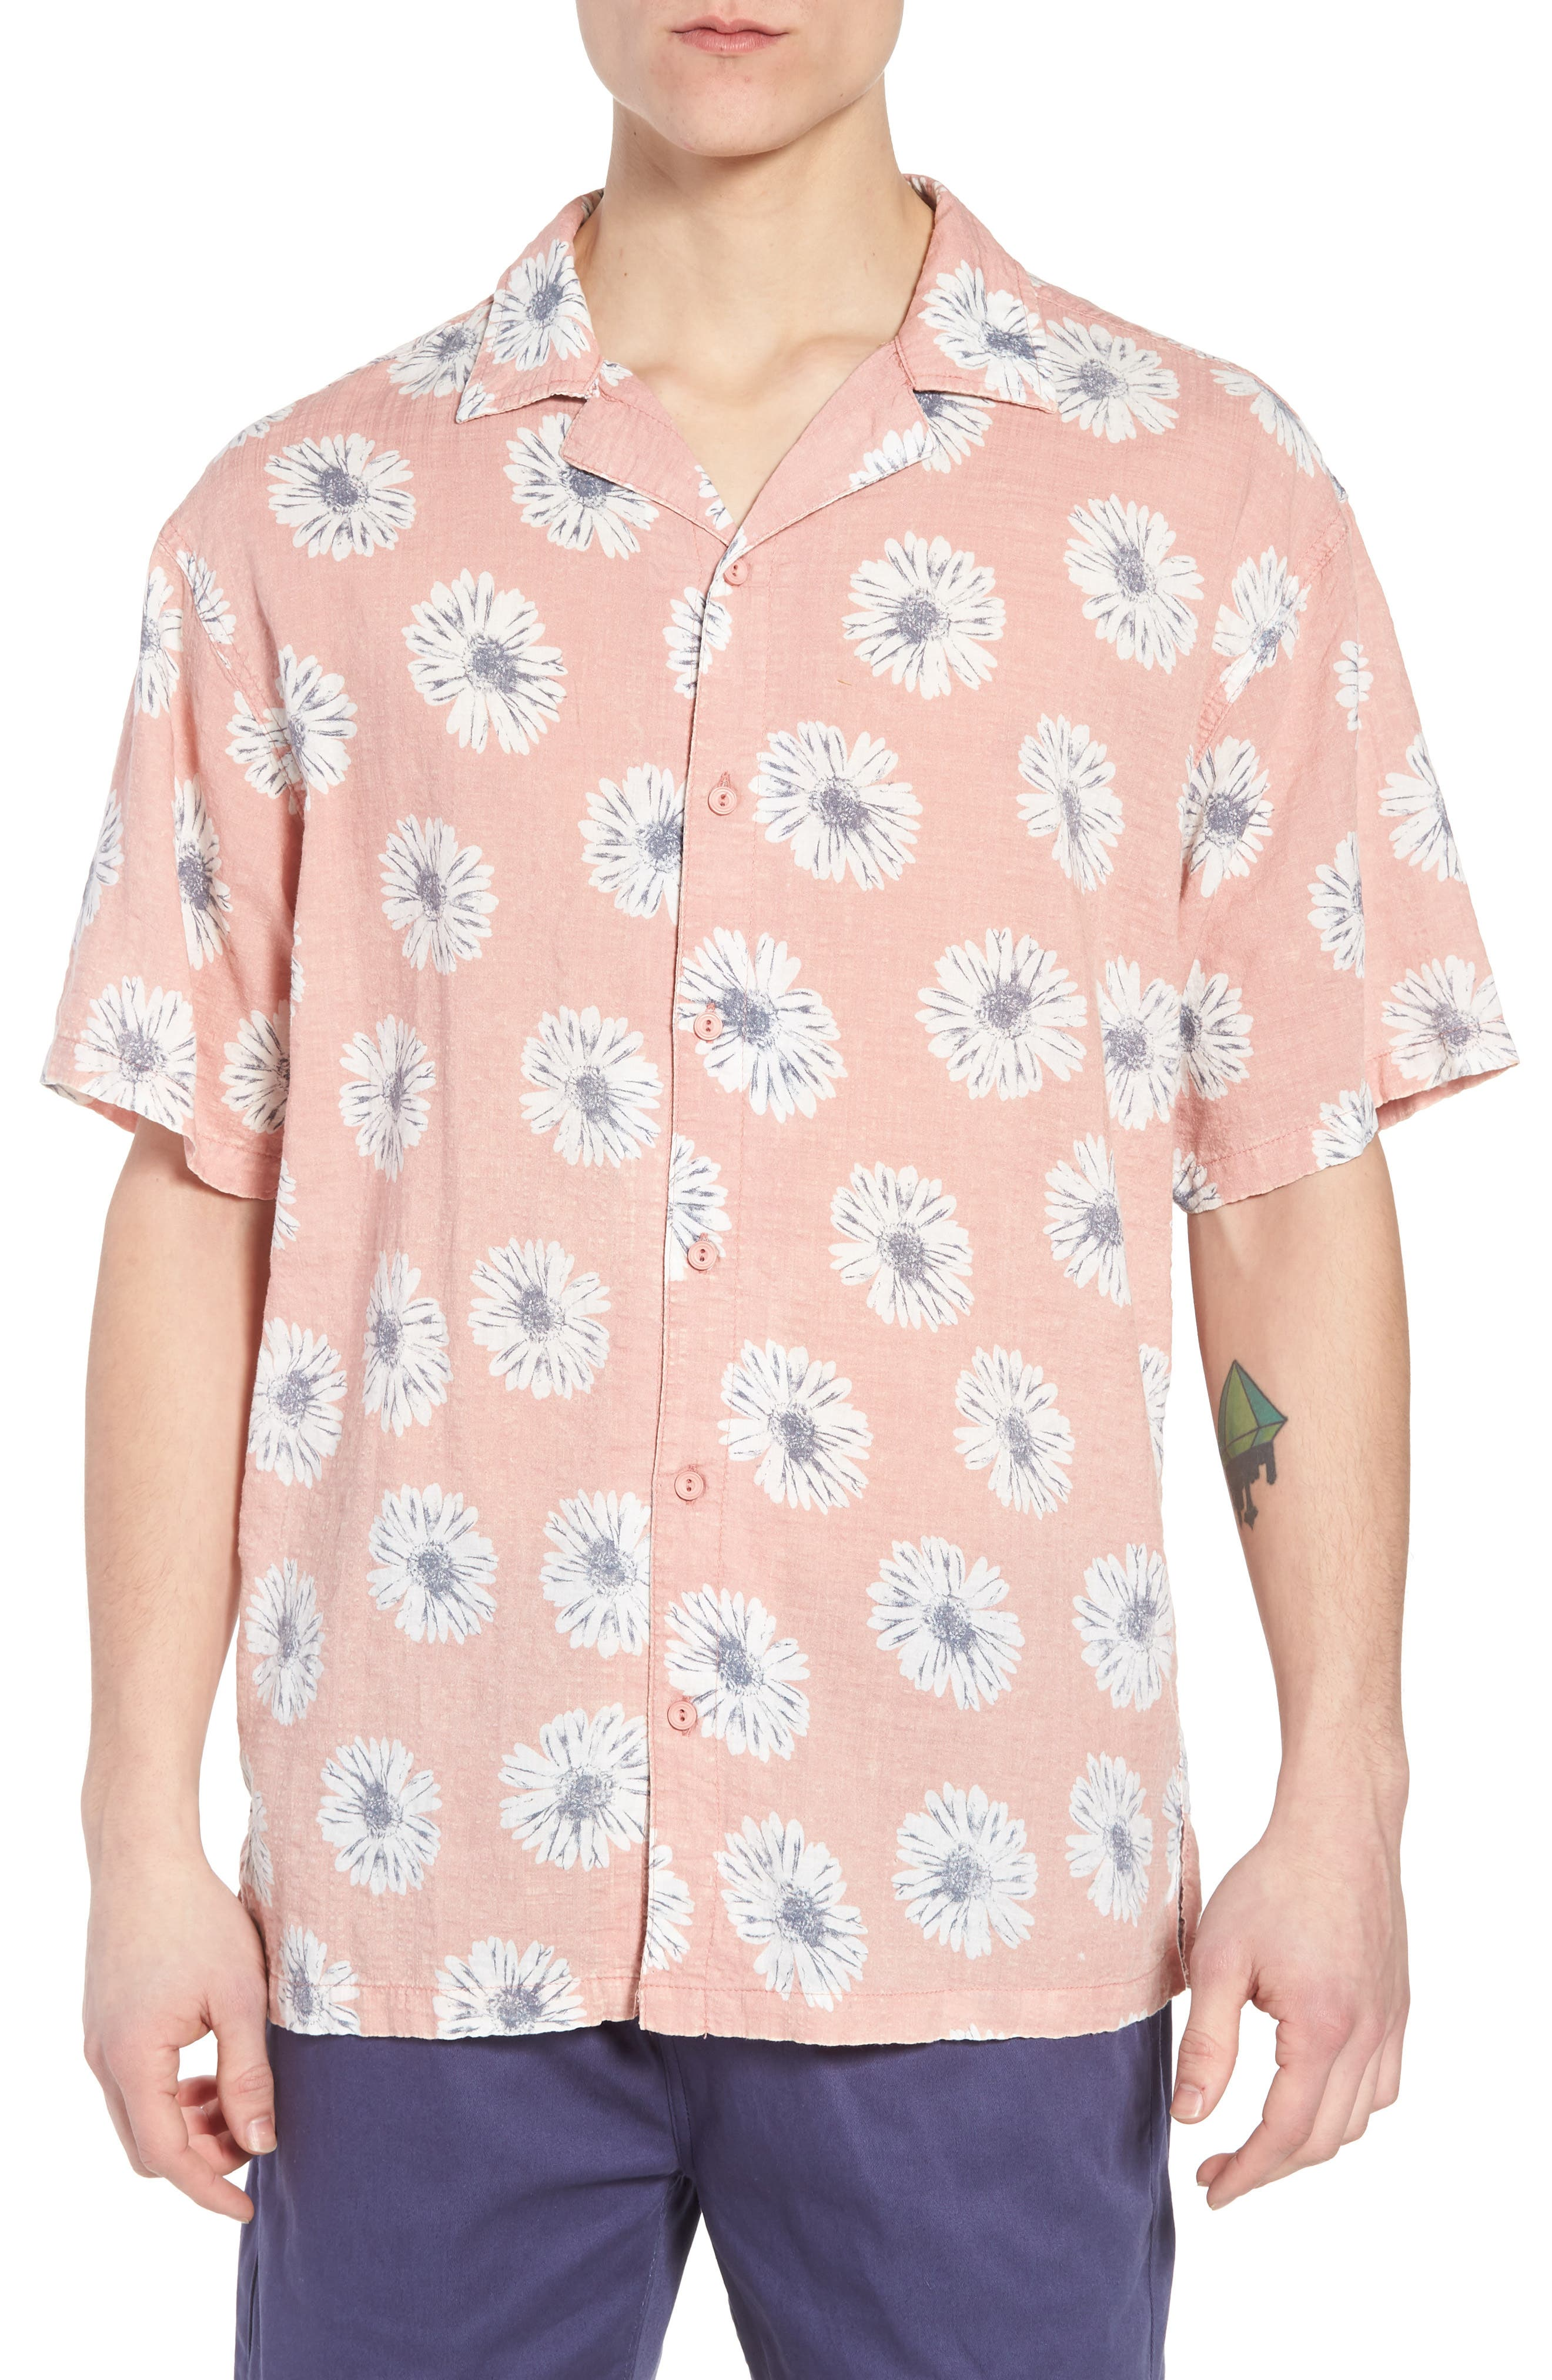 Ferris Woven Shirt,                             Main thumbnail 1, color,                             Pink